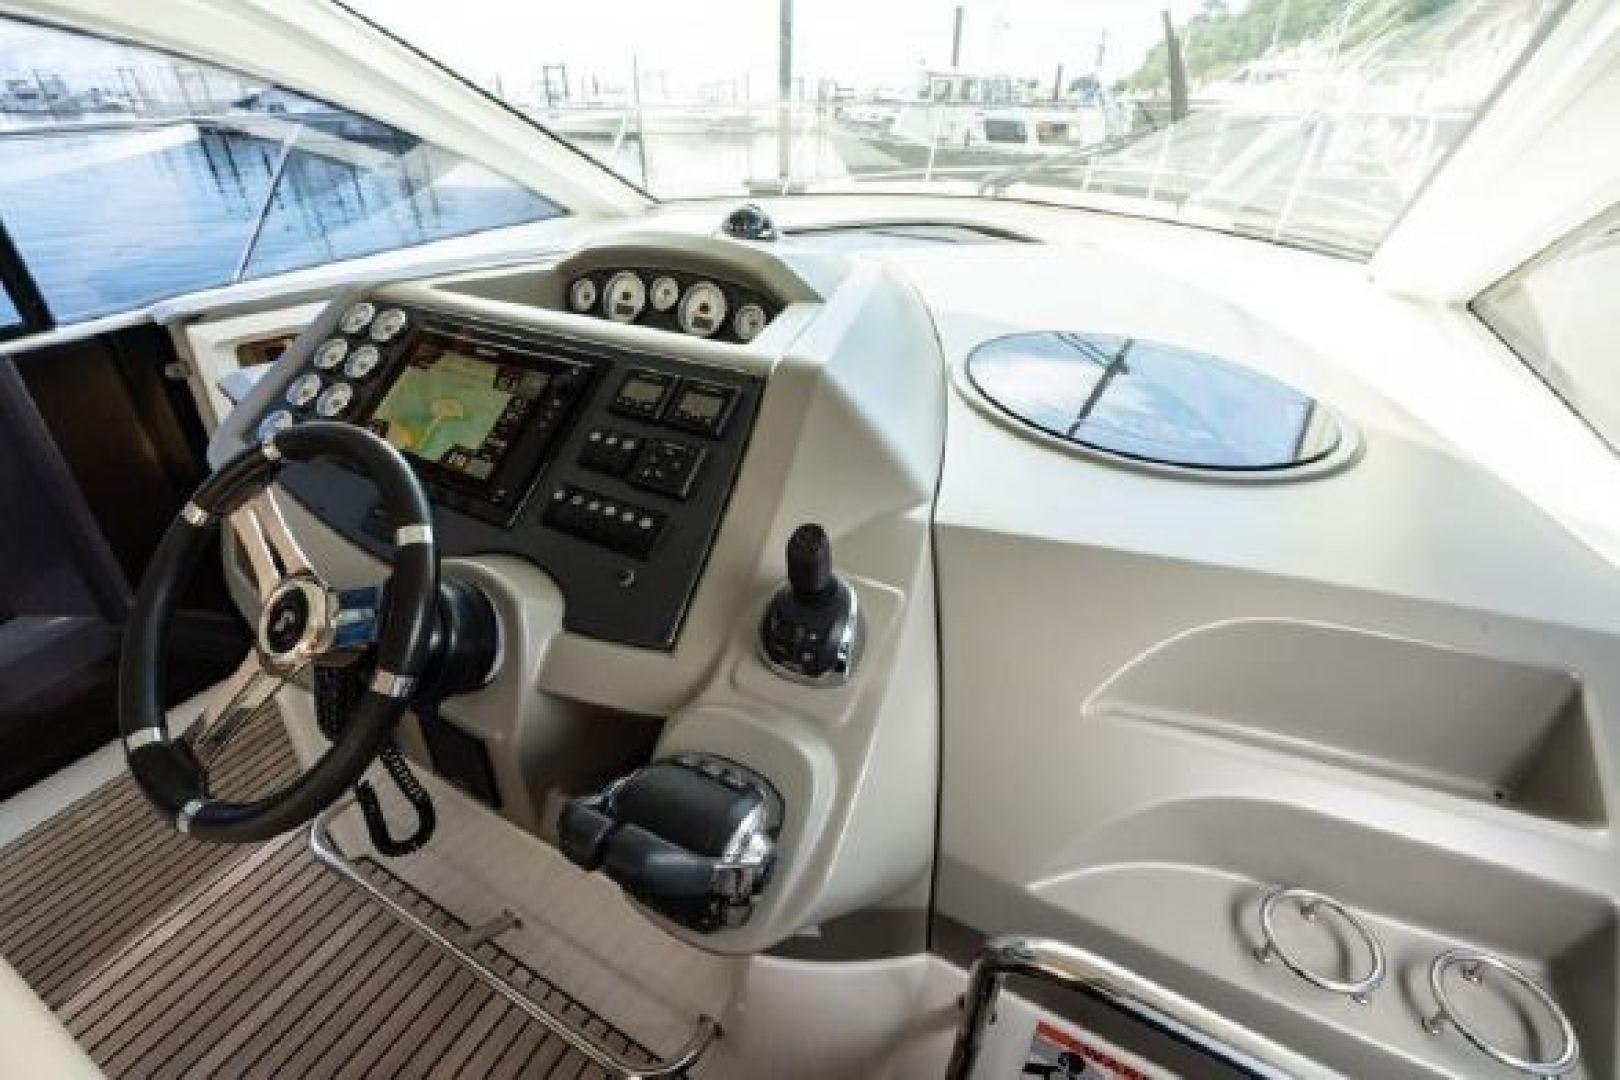 2014 Beneteau 38' Gran Turismo 38  | Picture 7 of 15